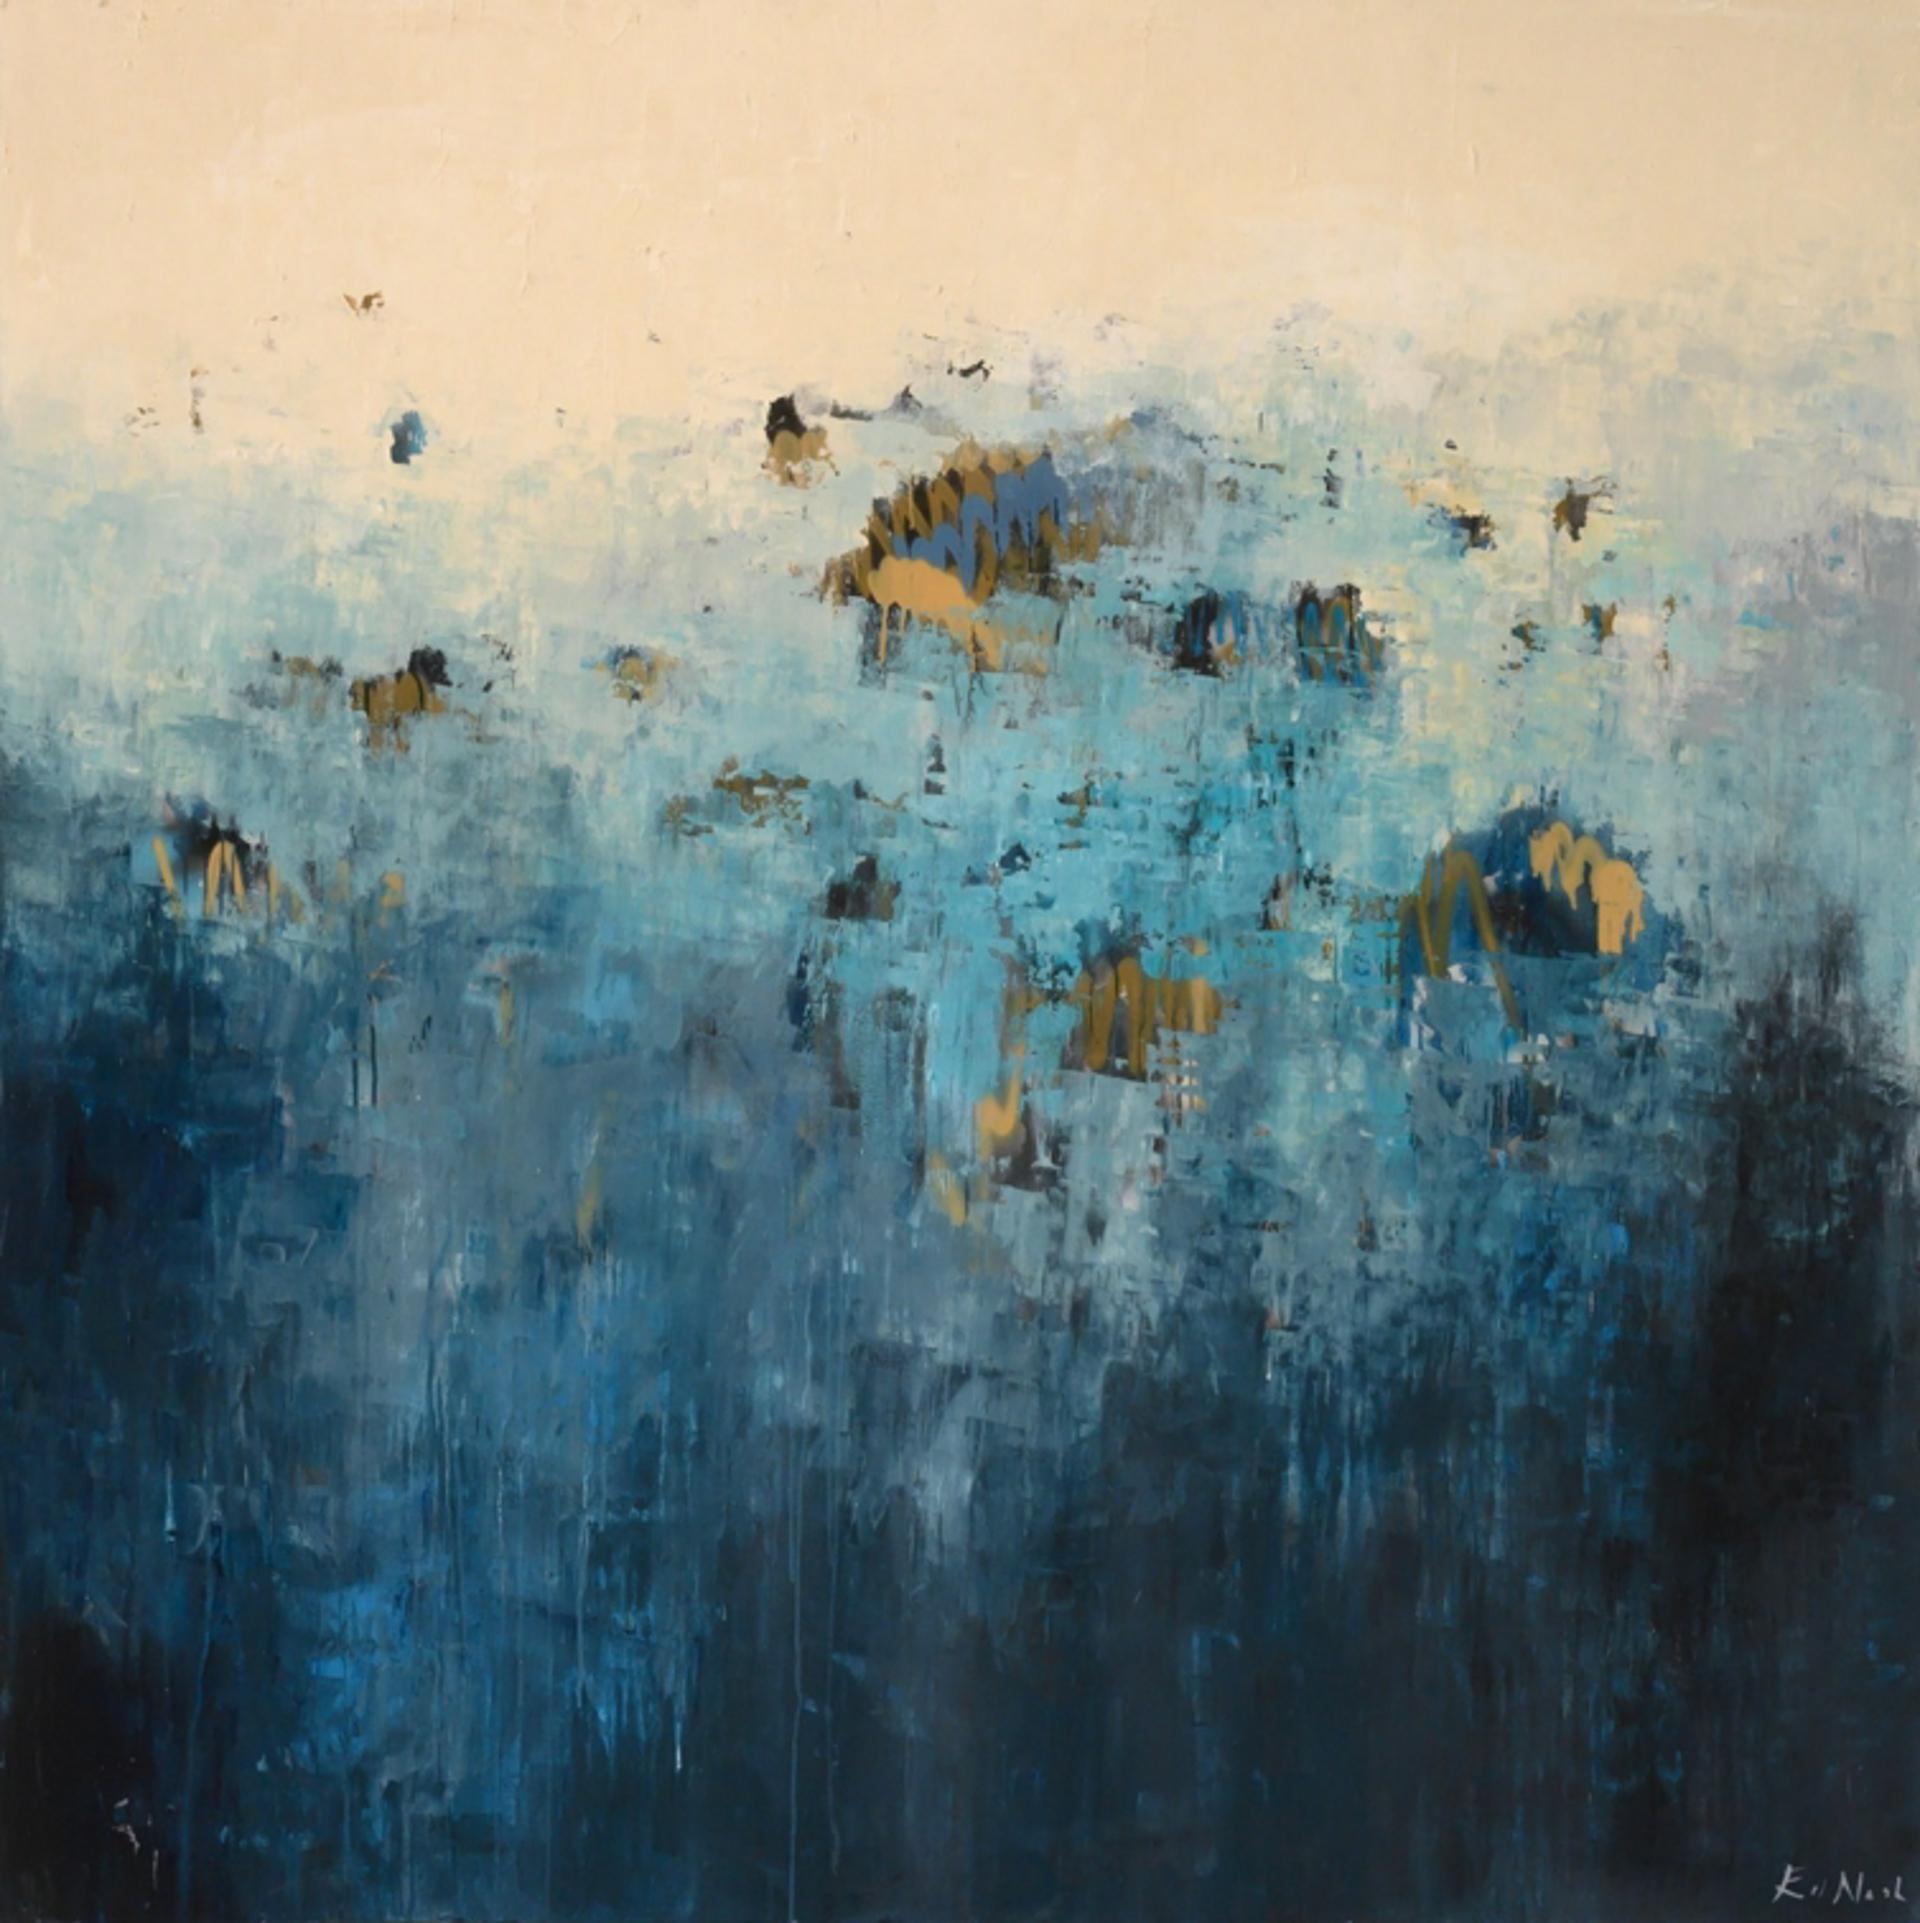 Prussian Rain by Ed Nash